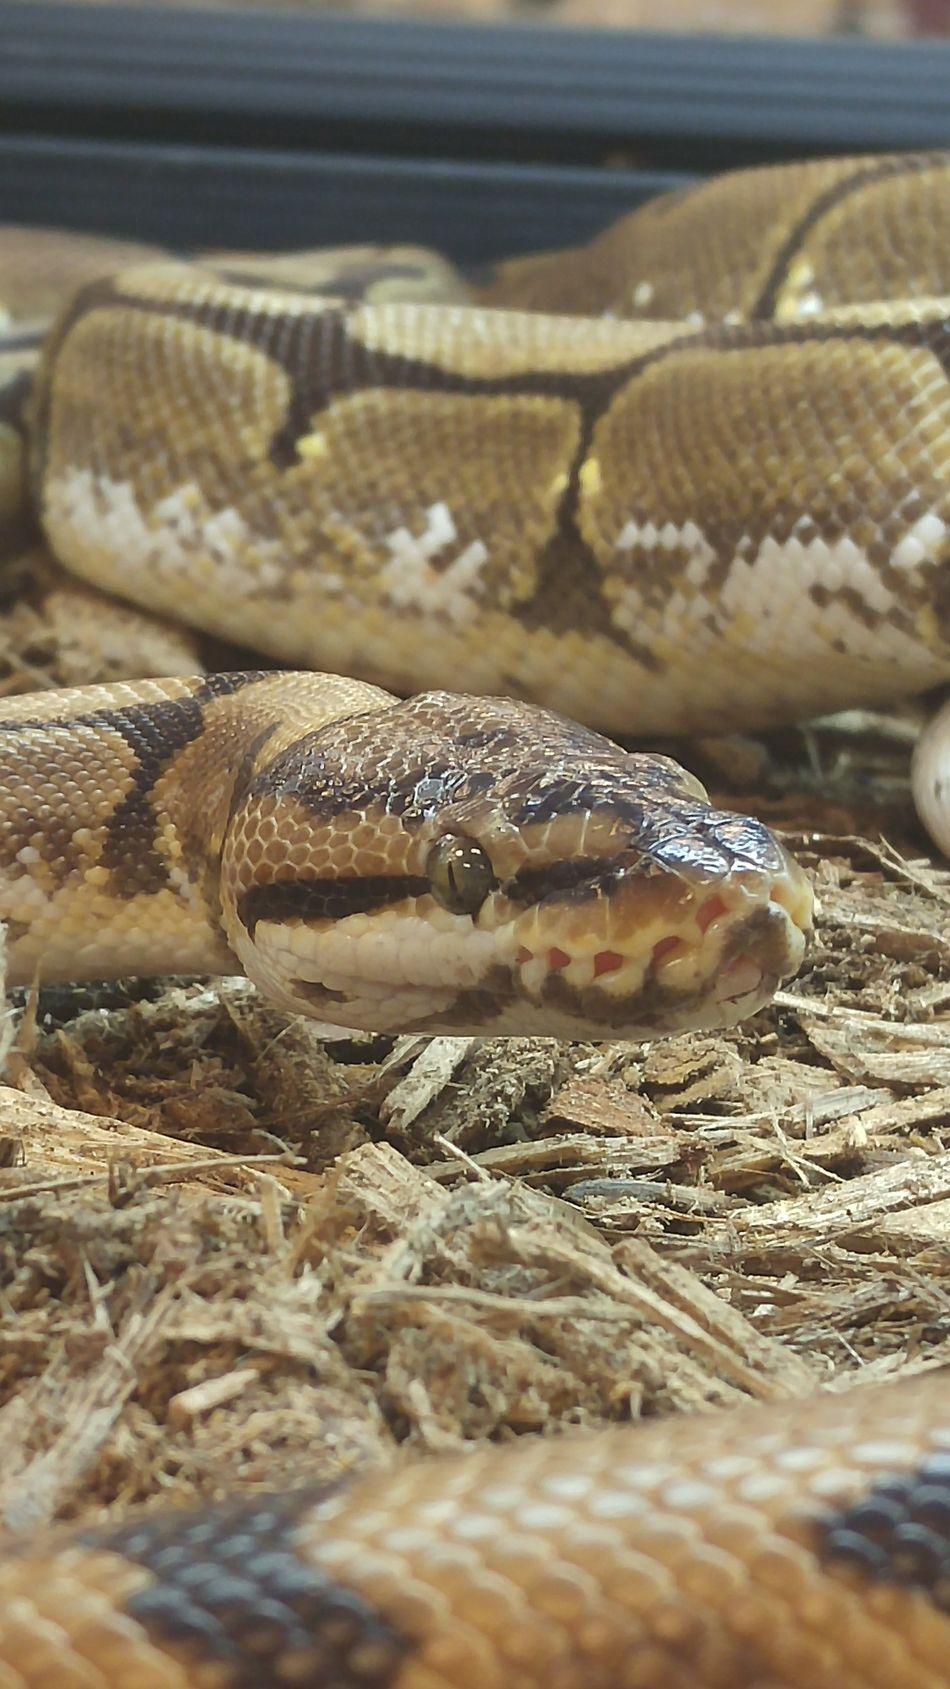 Snake Nashville Exotic Pet Expo 2016 Animals Reptile Baby Snake